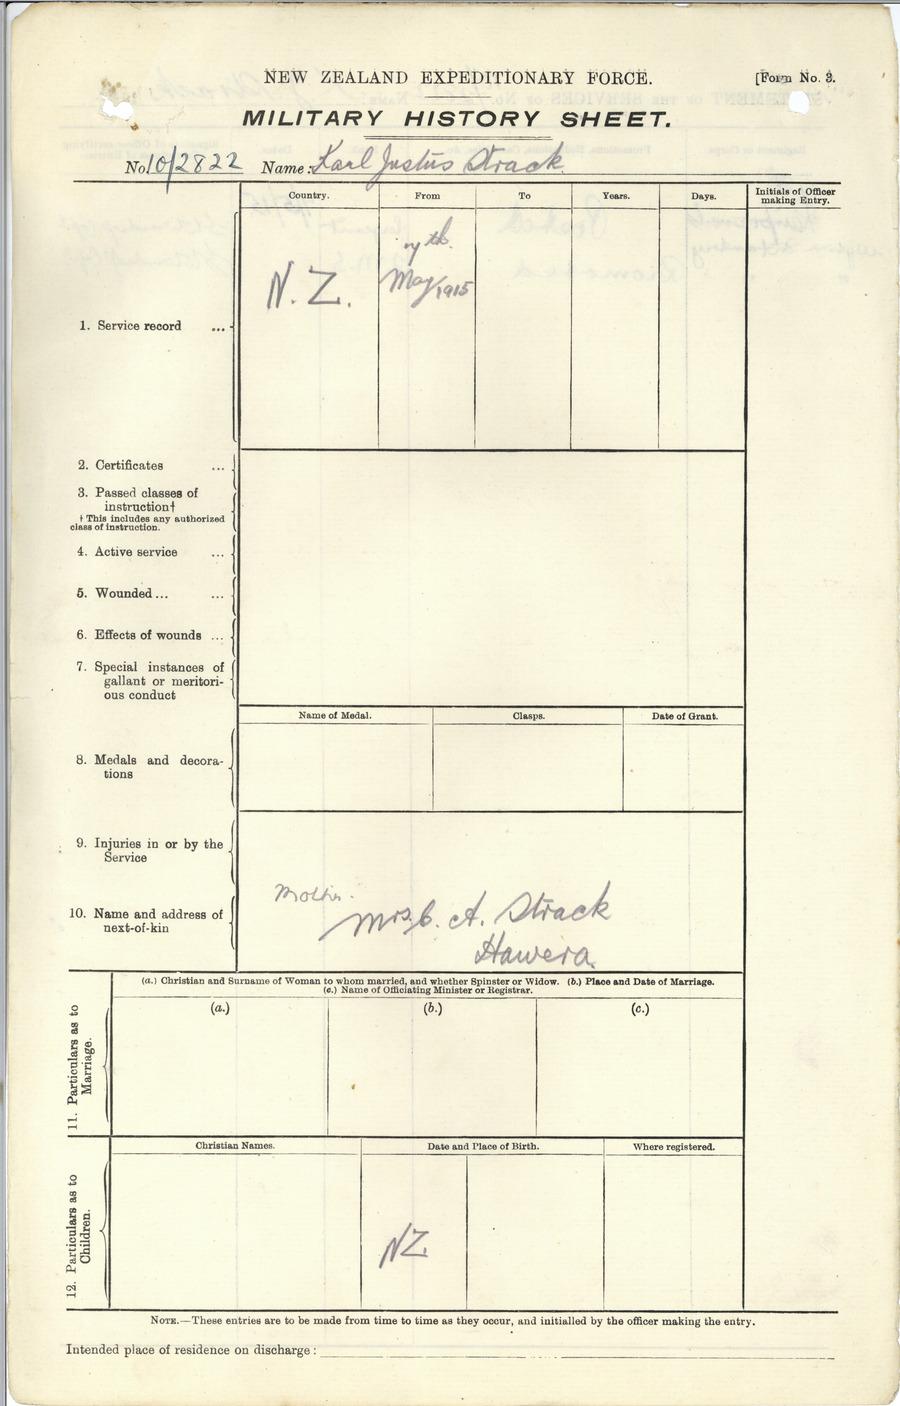 Strack KJ History Sheet Page 1